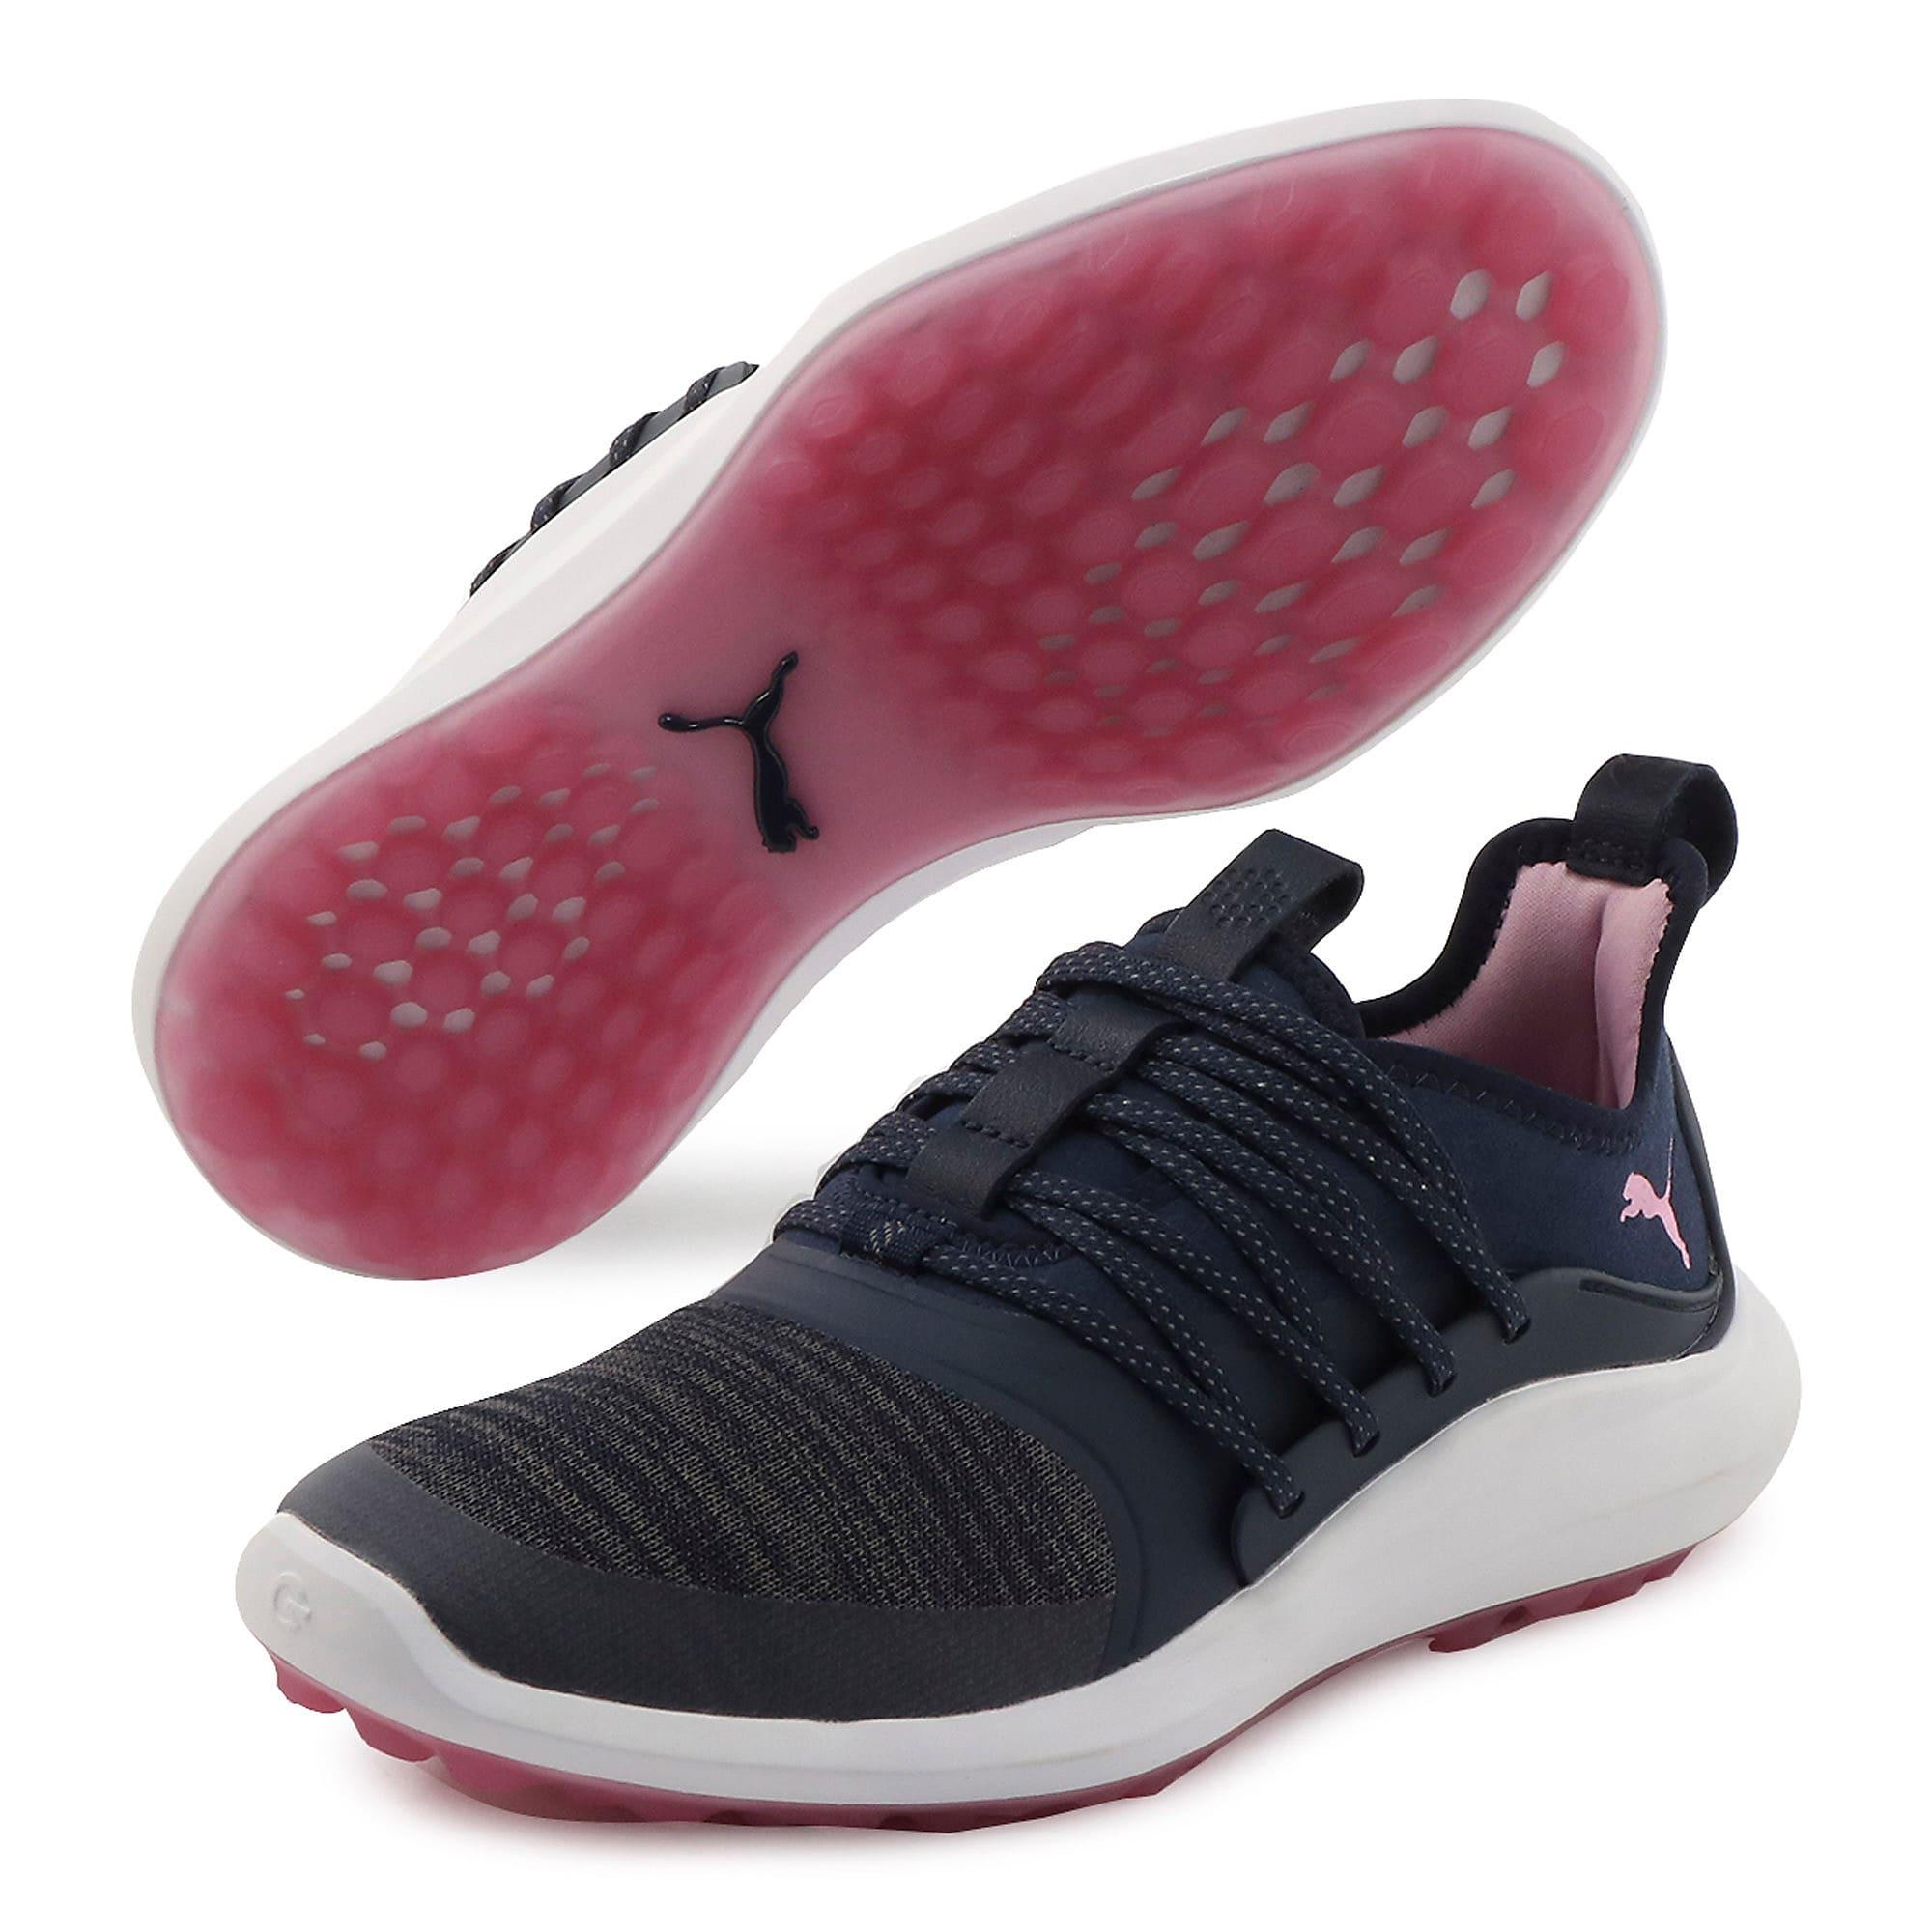 Thumbnail 2 of IGNITE NXT SOLELACE Damen Golf-Sneaker, Peacoat-Metallic Pink, medium